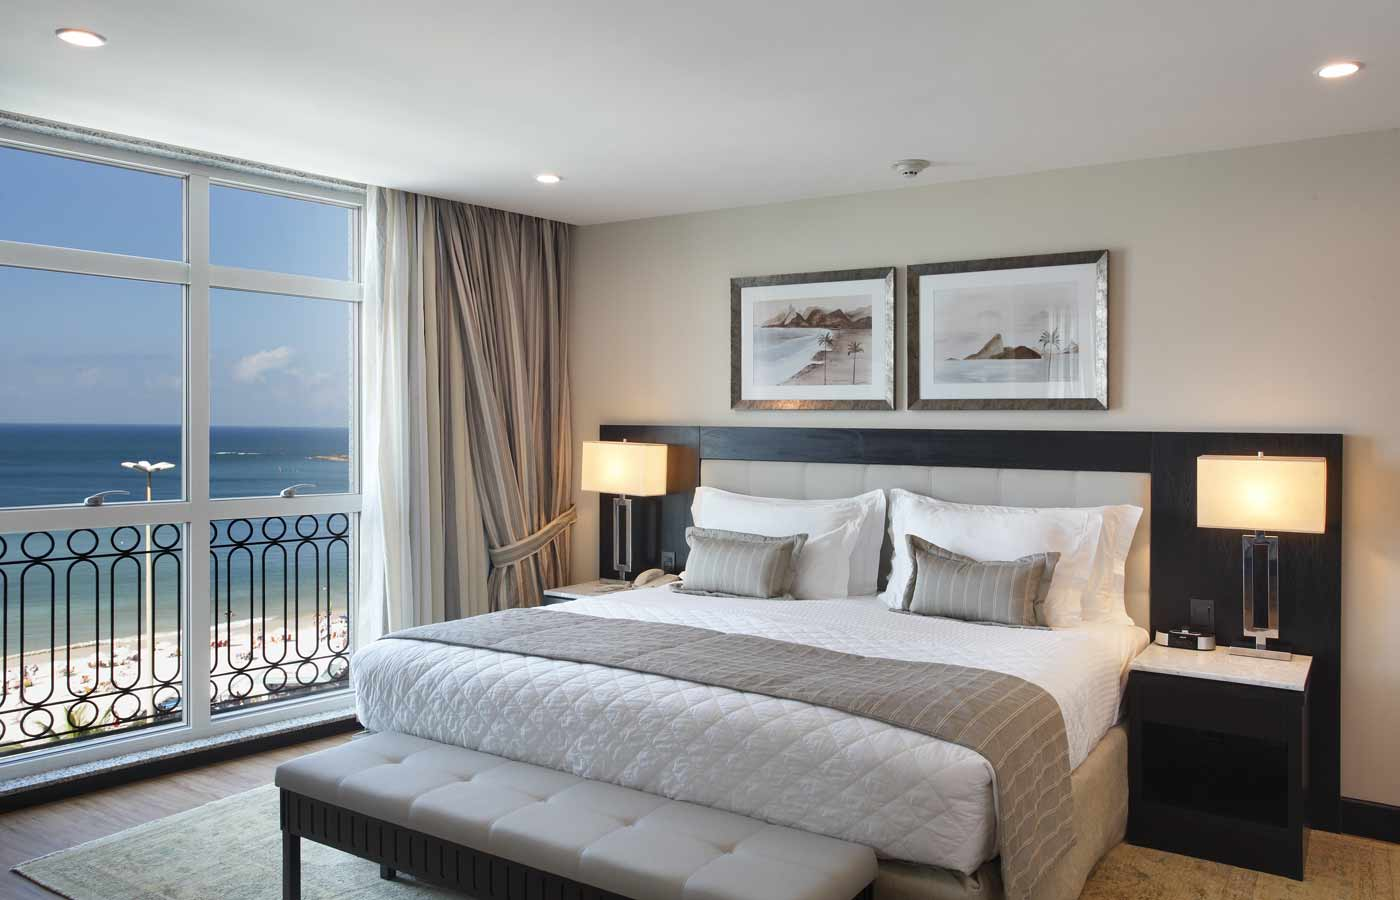 Hotel Miramar by Windsor- Luxury holidays to Rio de Janeiro, Brazil